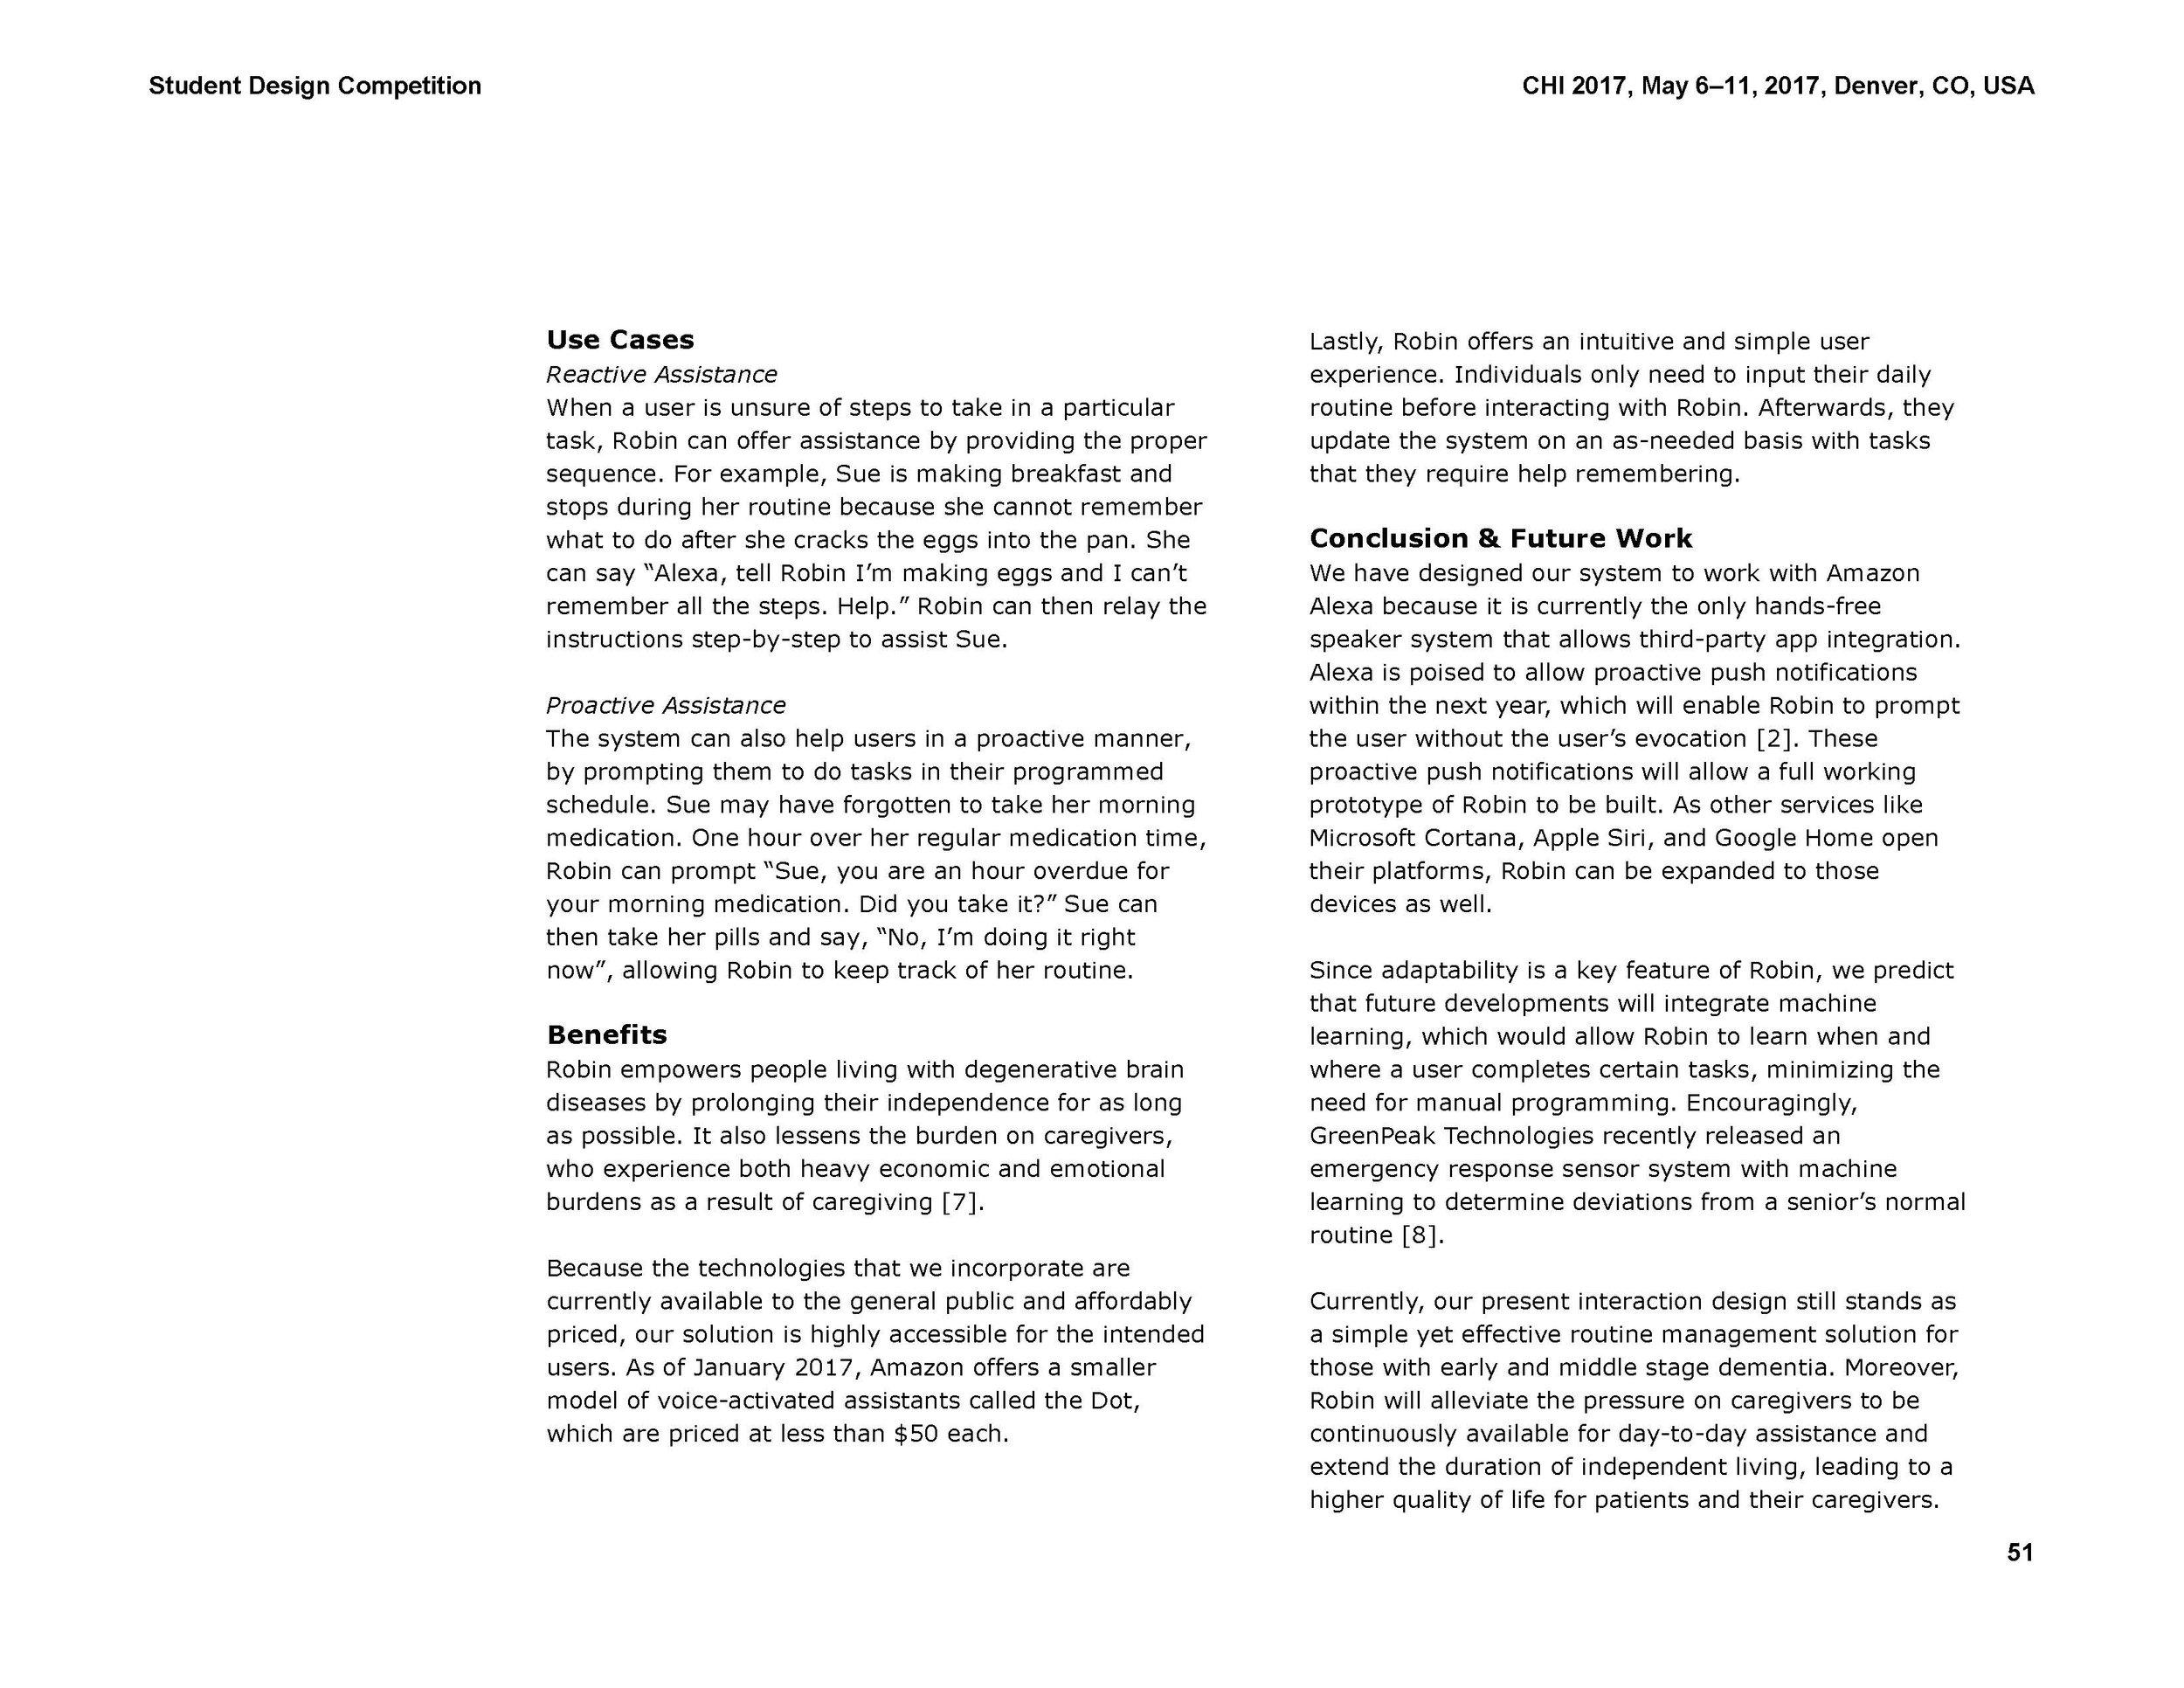 Robin paper final_Page_6.jpg